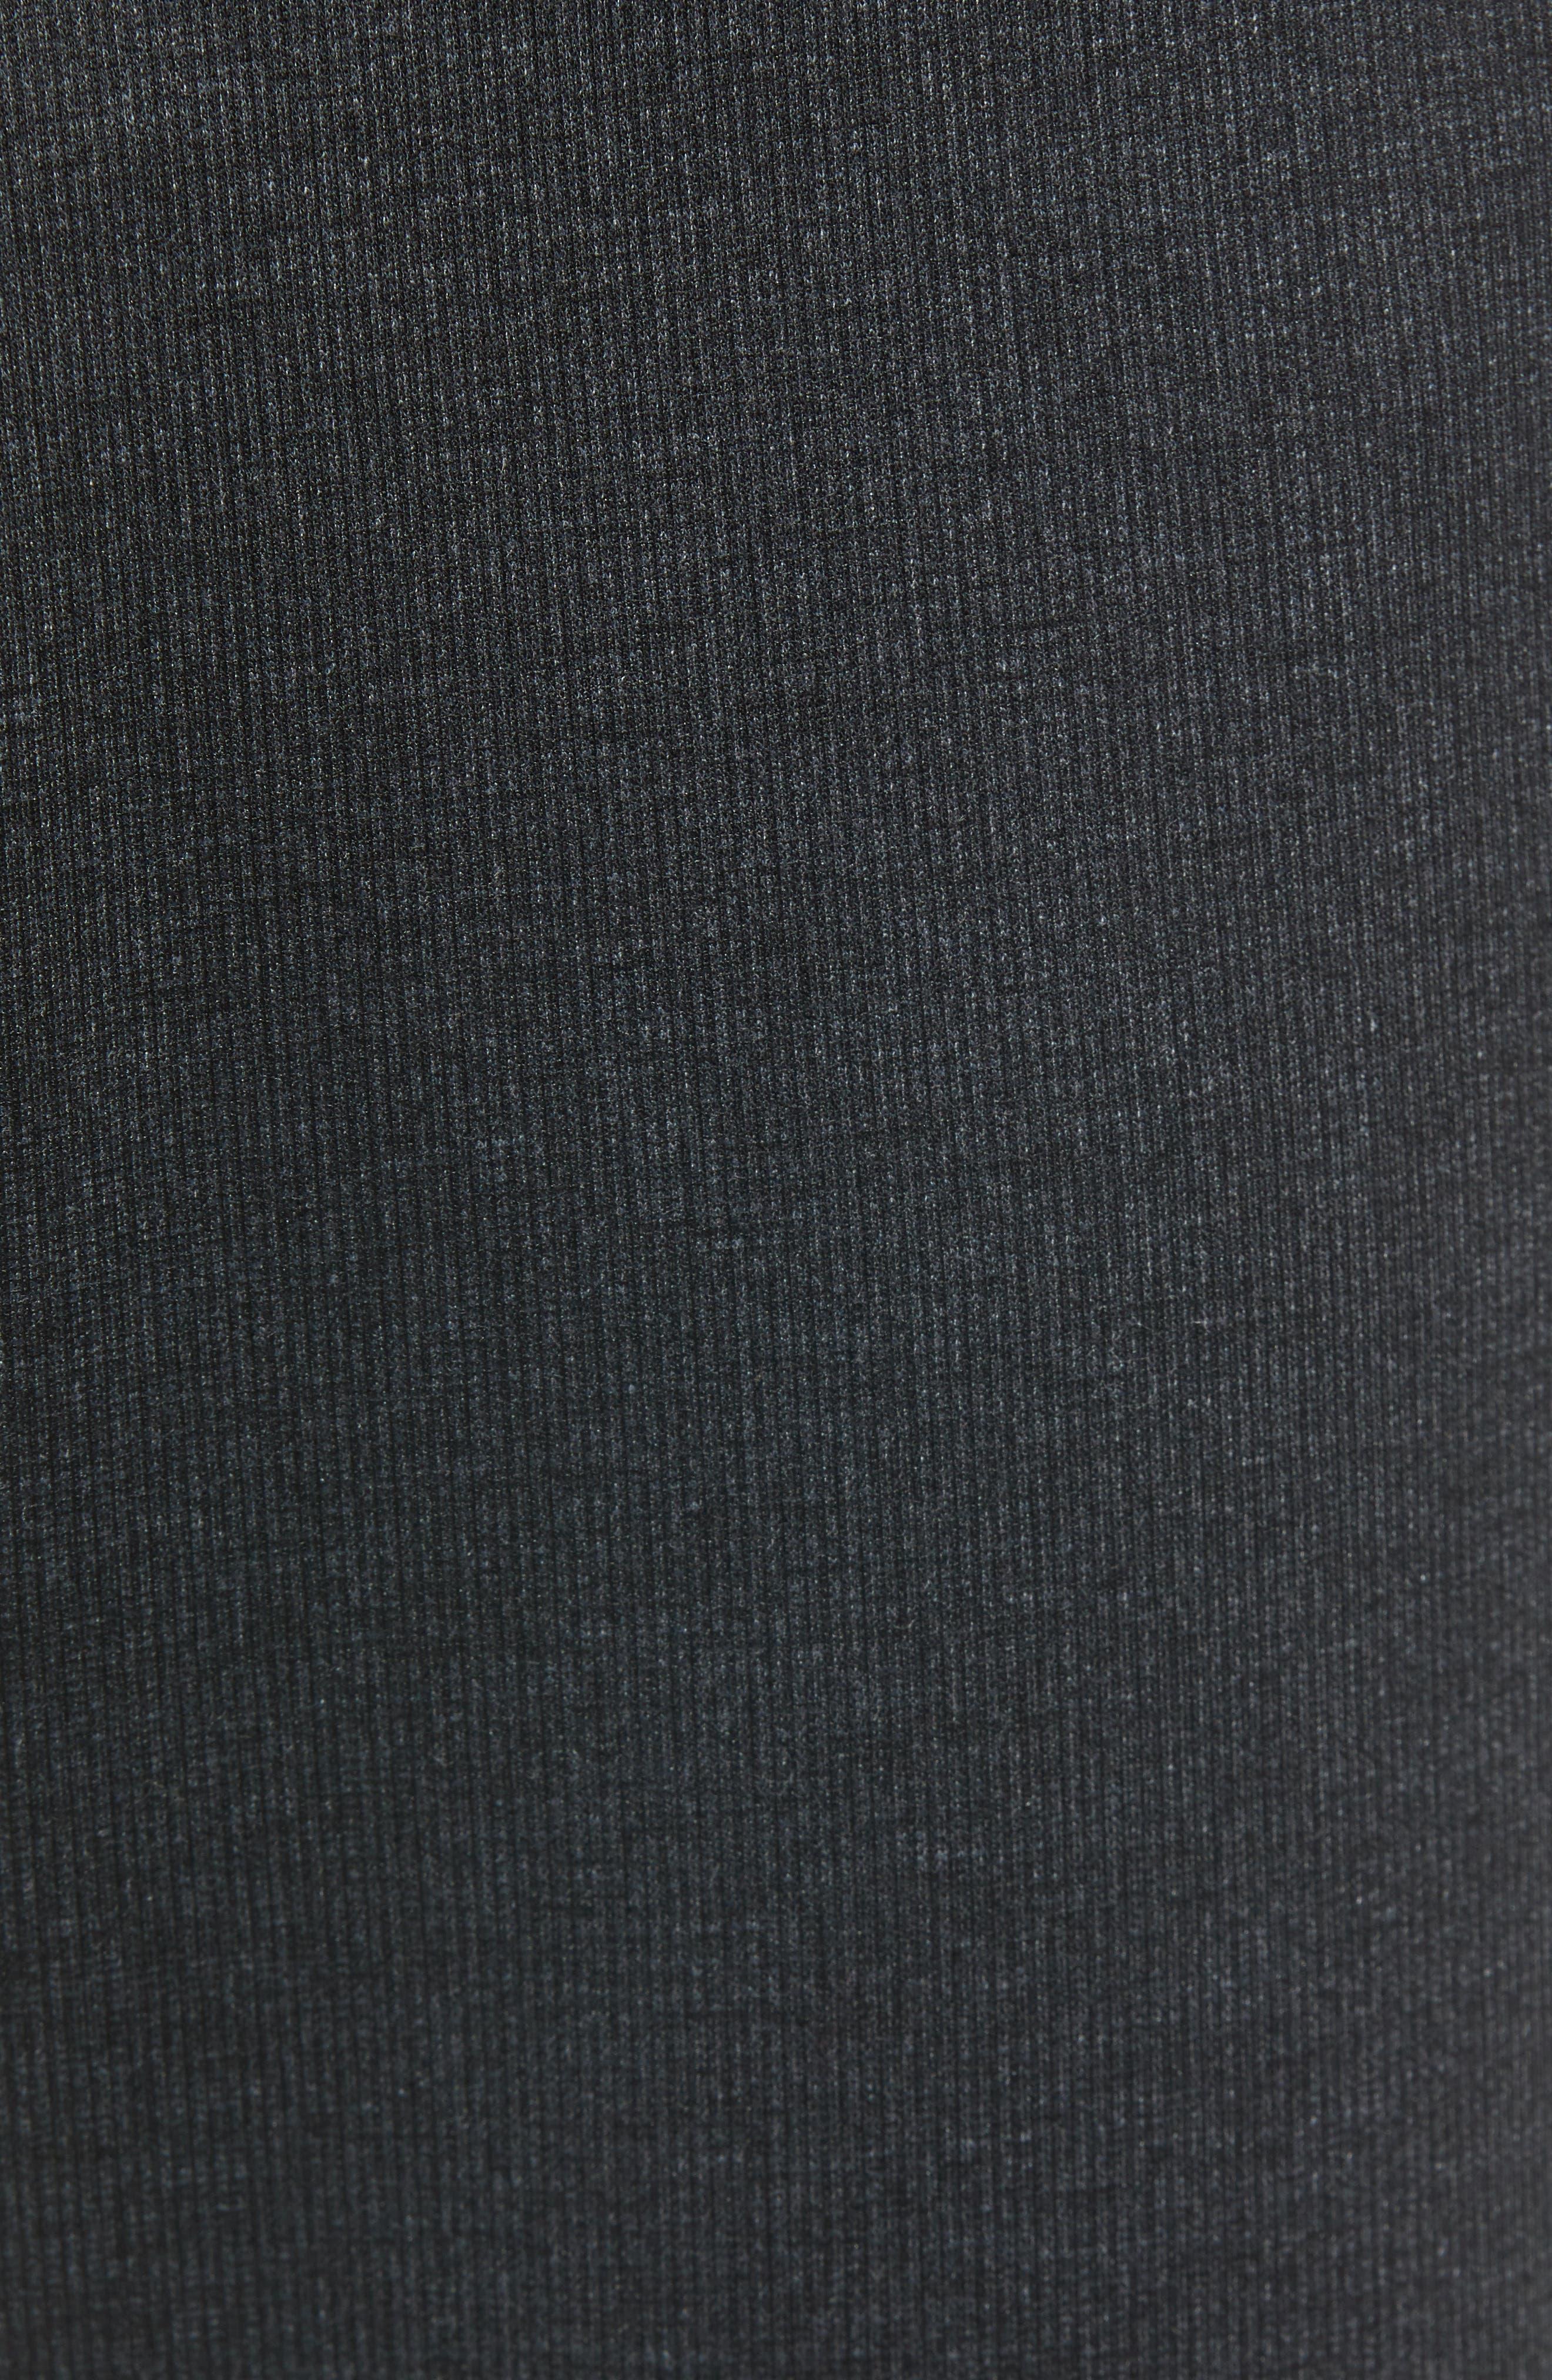 Slim Fit Ponte Knit Trousers,                             Alternate thumbnail 5, color,                             020